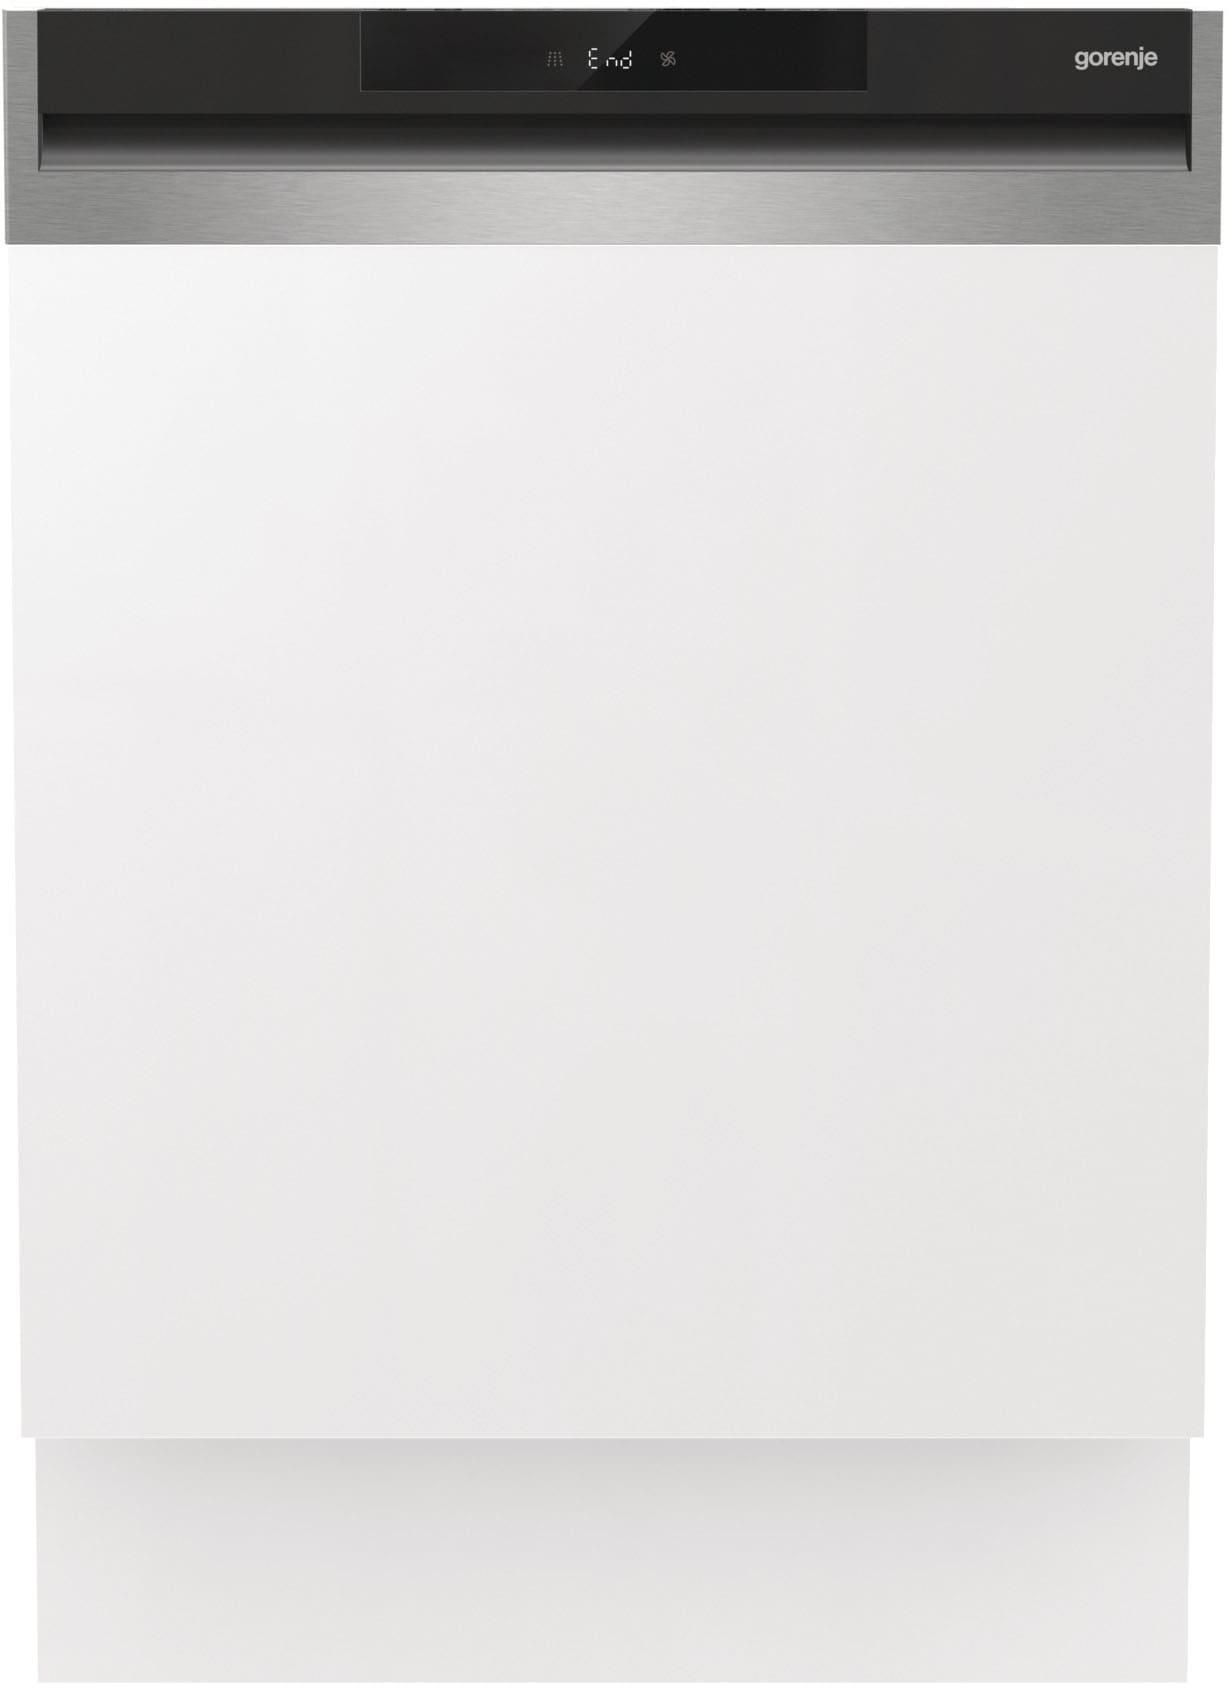 GORENJE teilintegrierbarer Geschirrspüler GI661C60X , GI661C60X, 16 Massgedecke